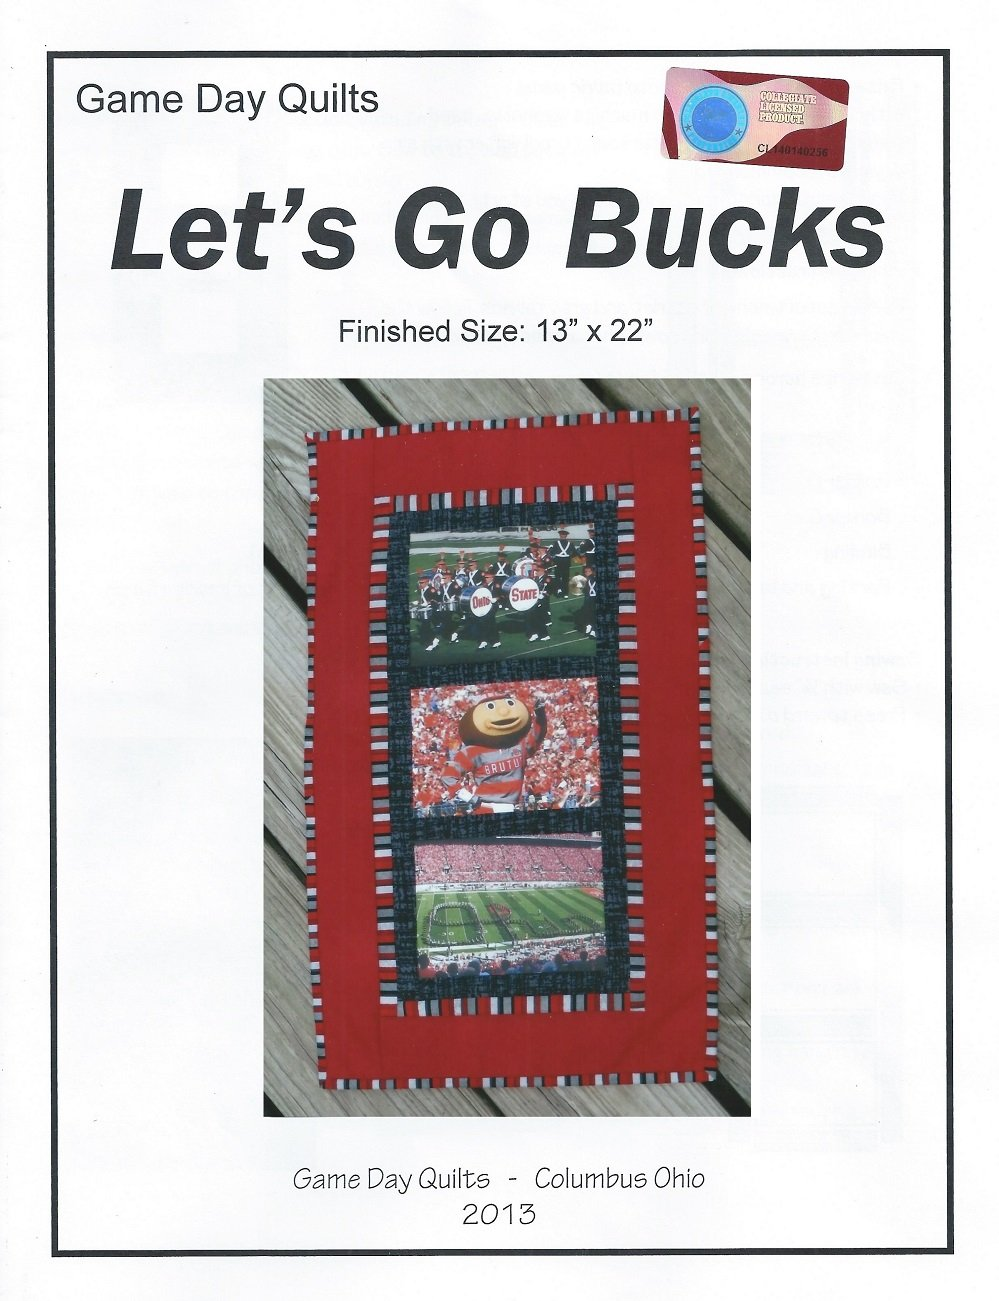 OSU Game Day Quilt Pattern - Let's Go Bucks!